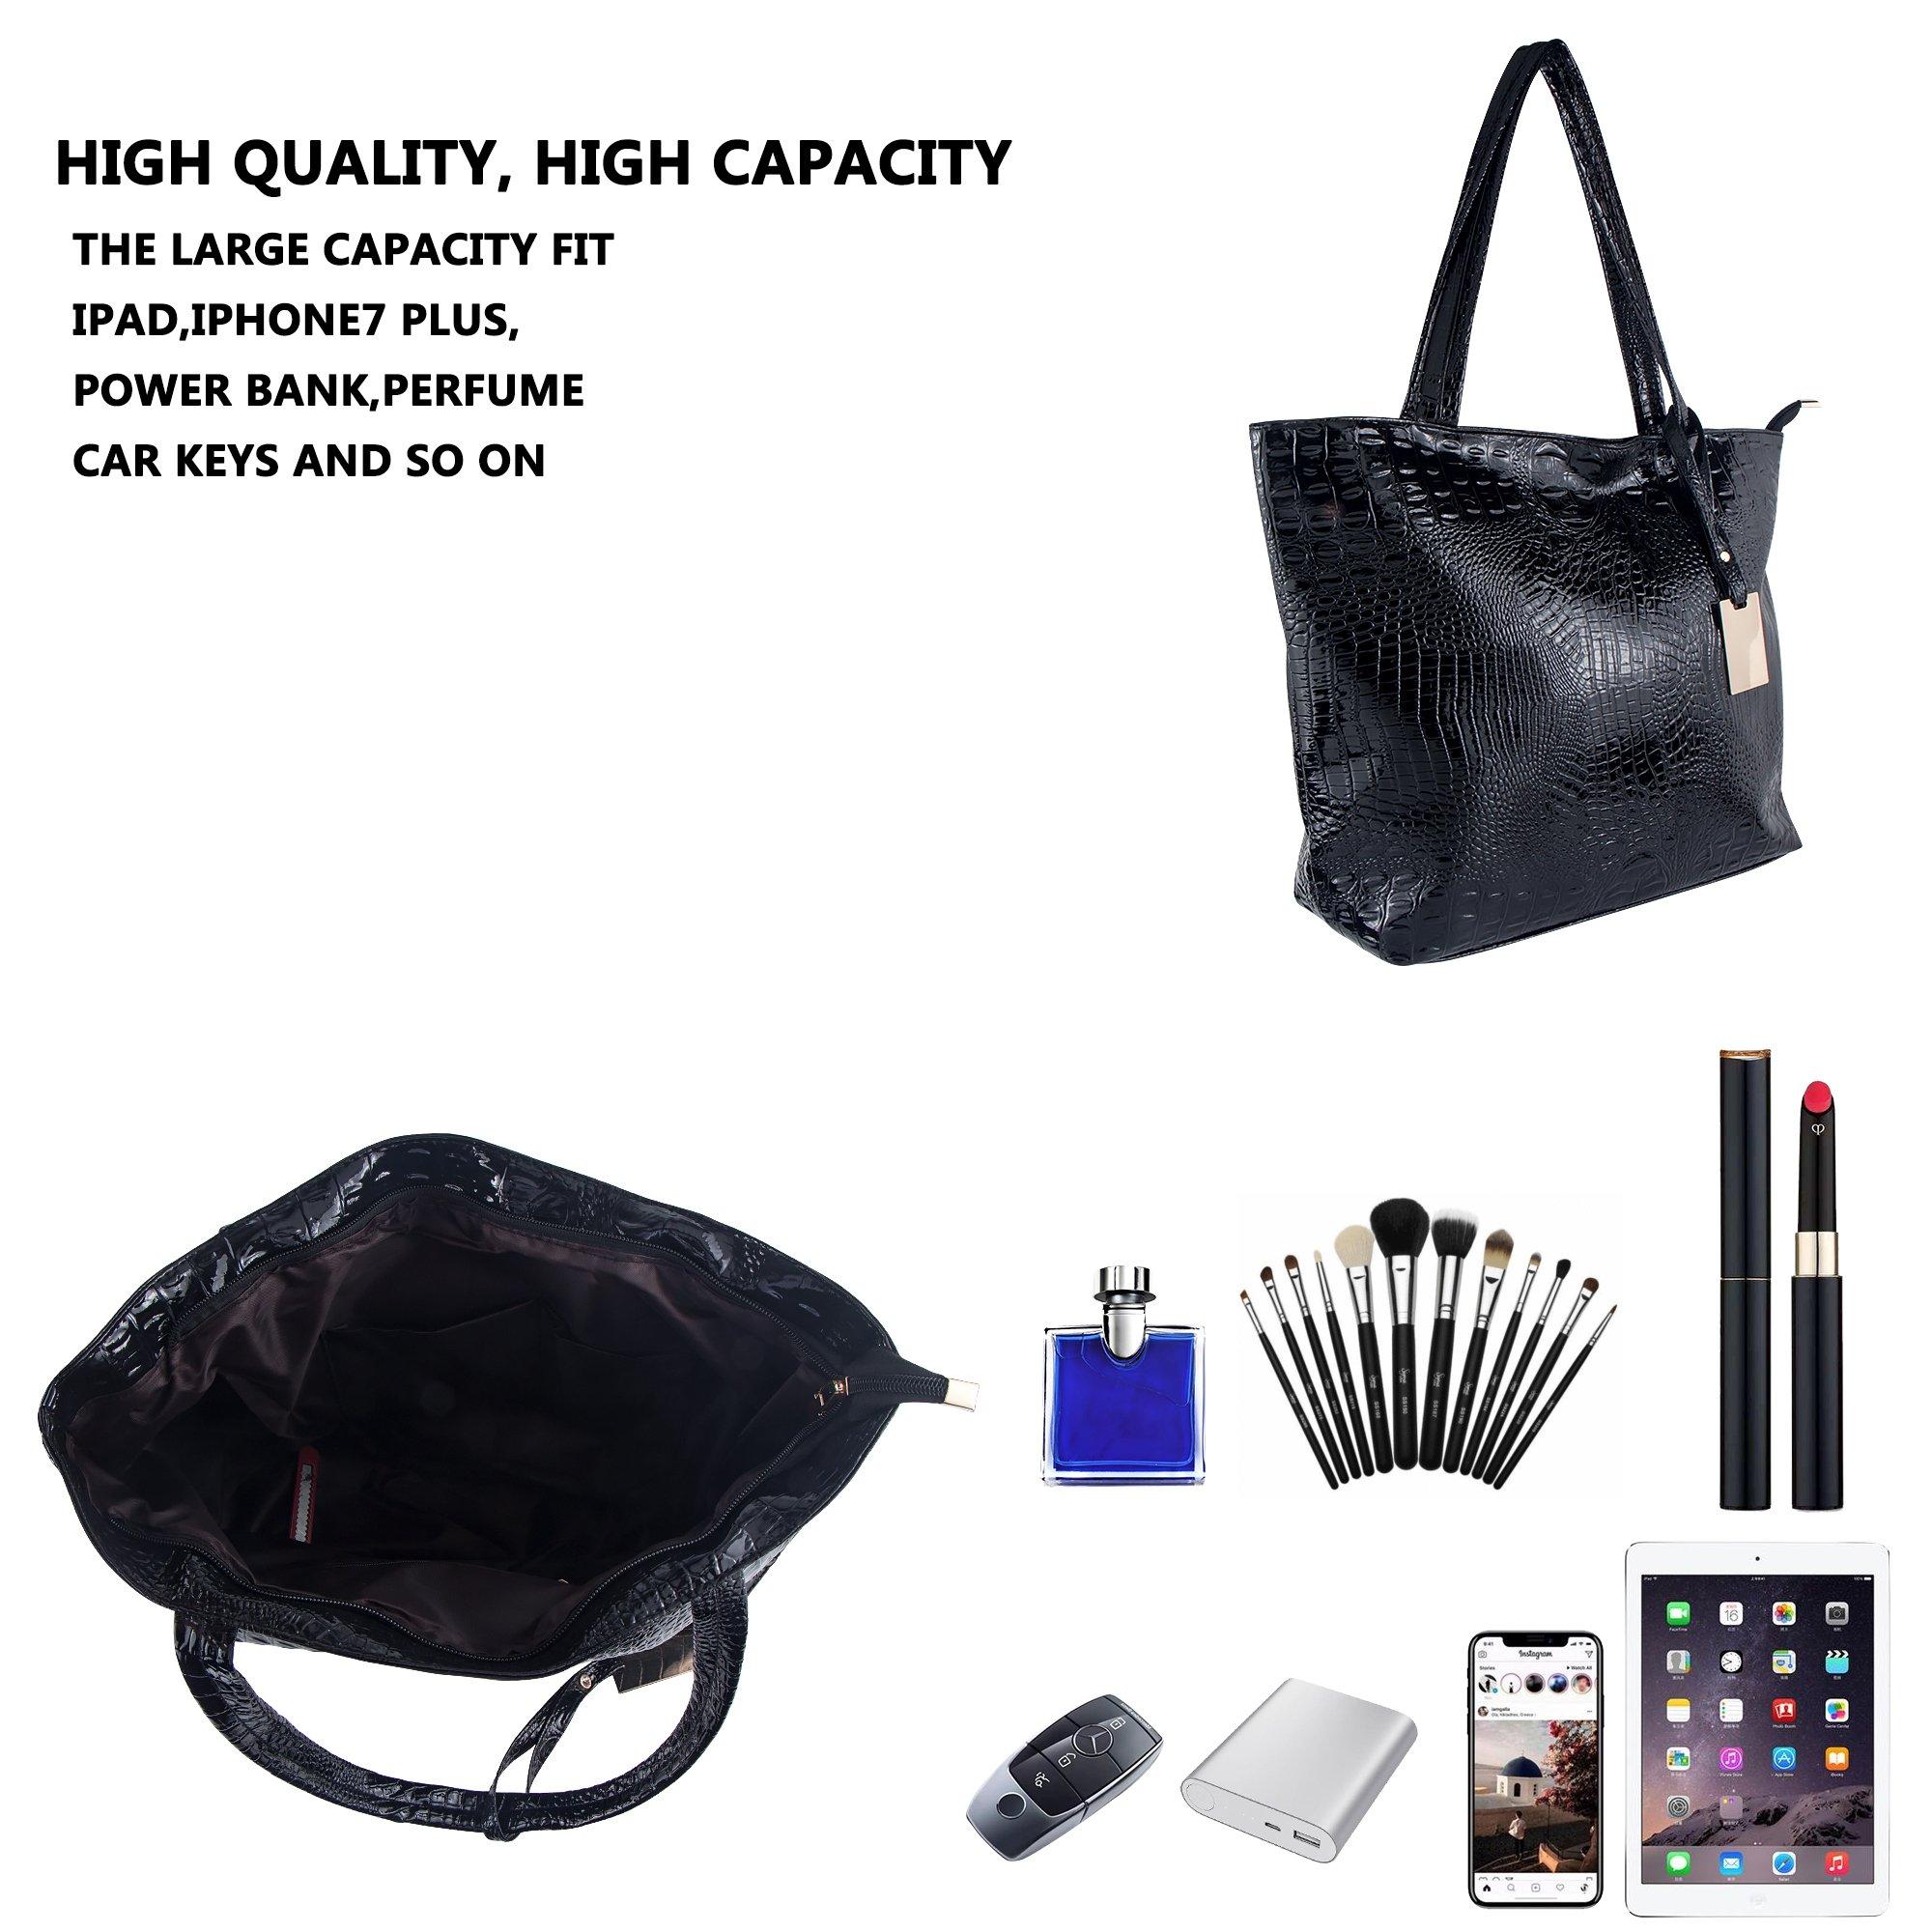 Bagood Womens Crocodile Pattern PU Leather Casual Shopping Handbags High Capacity Shoulder Ladies Soft Bag for Wedding Bridal Prom Party Black by Bagood (Image #6)